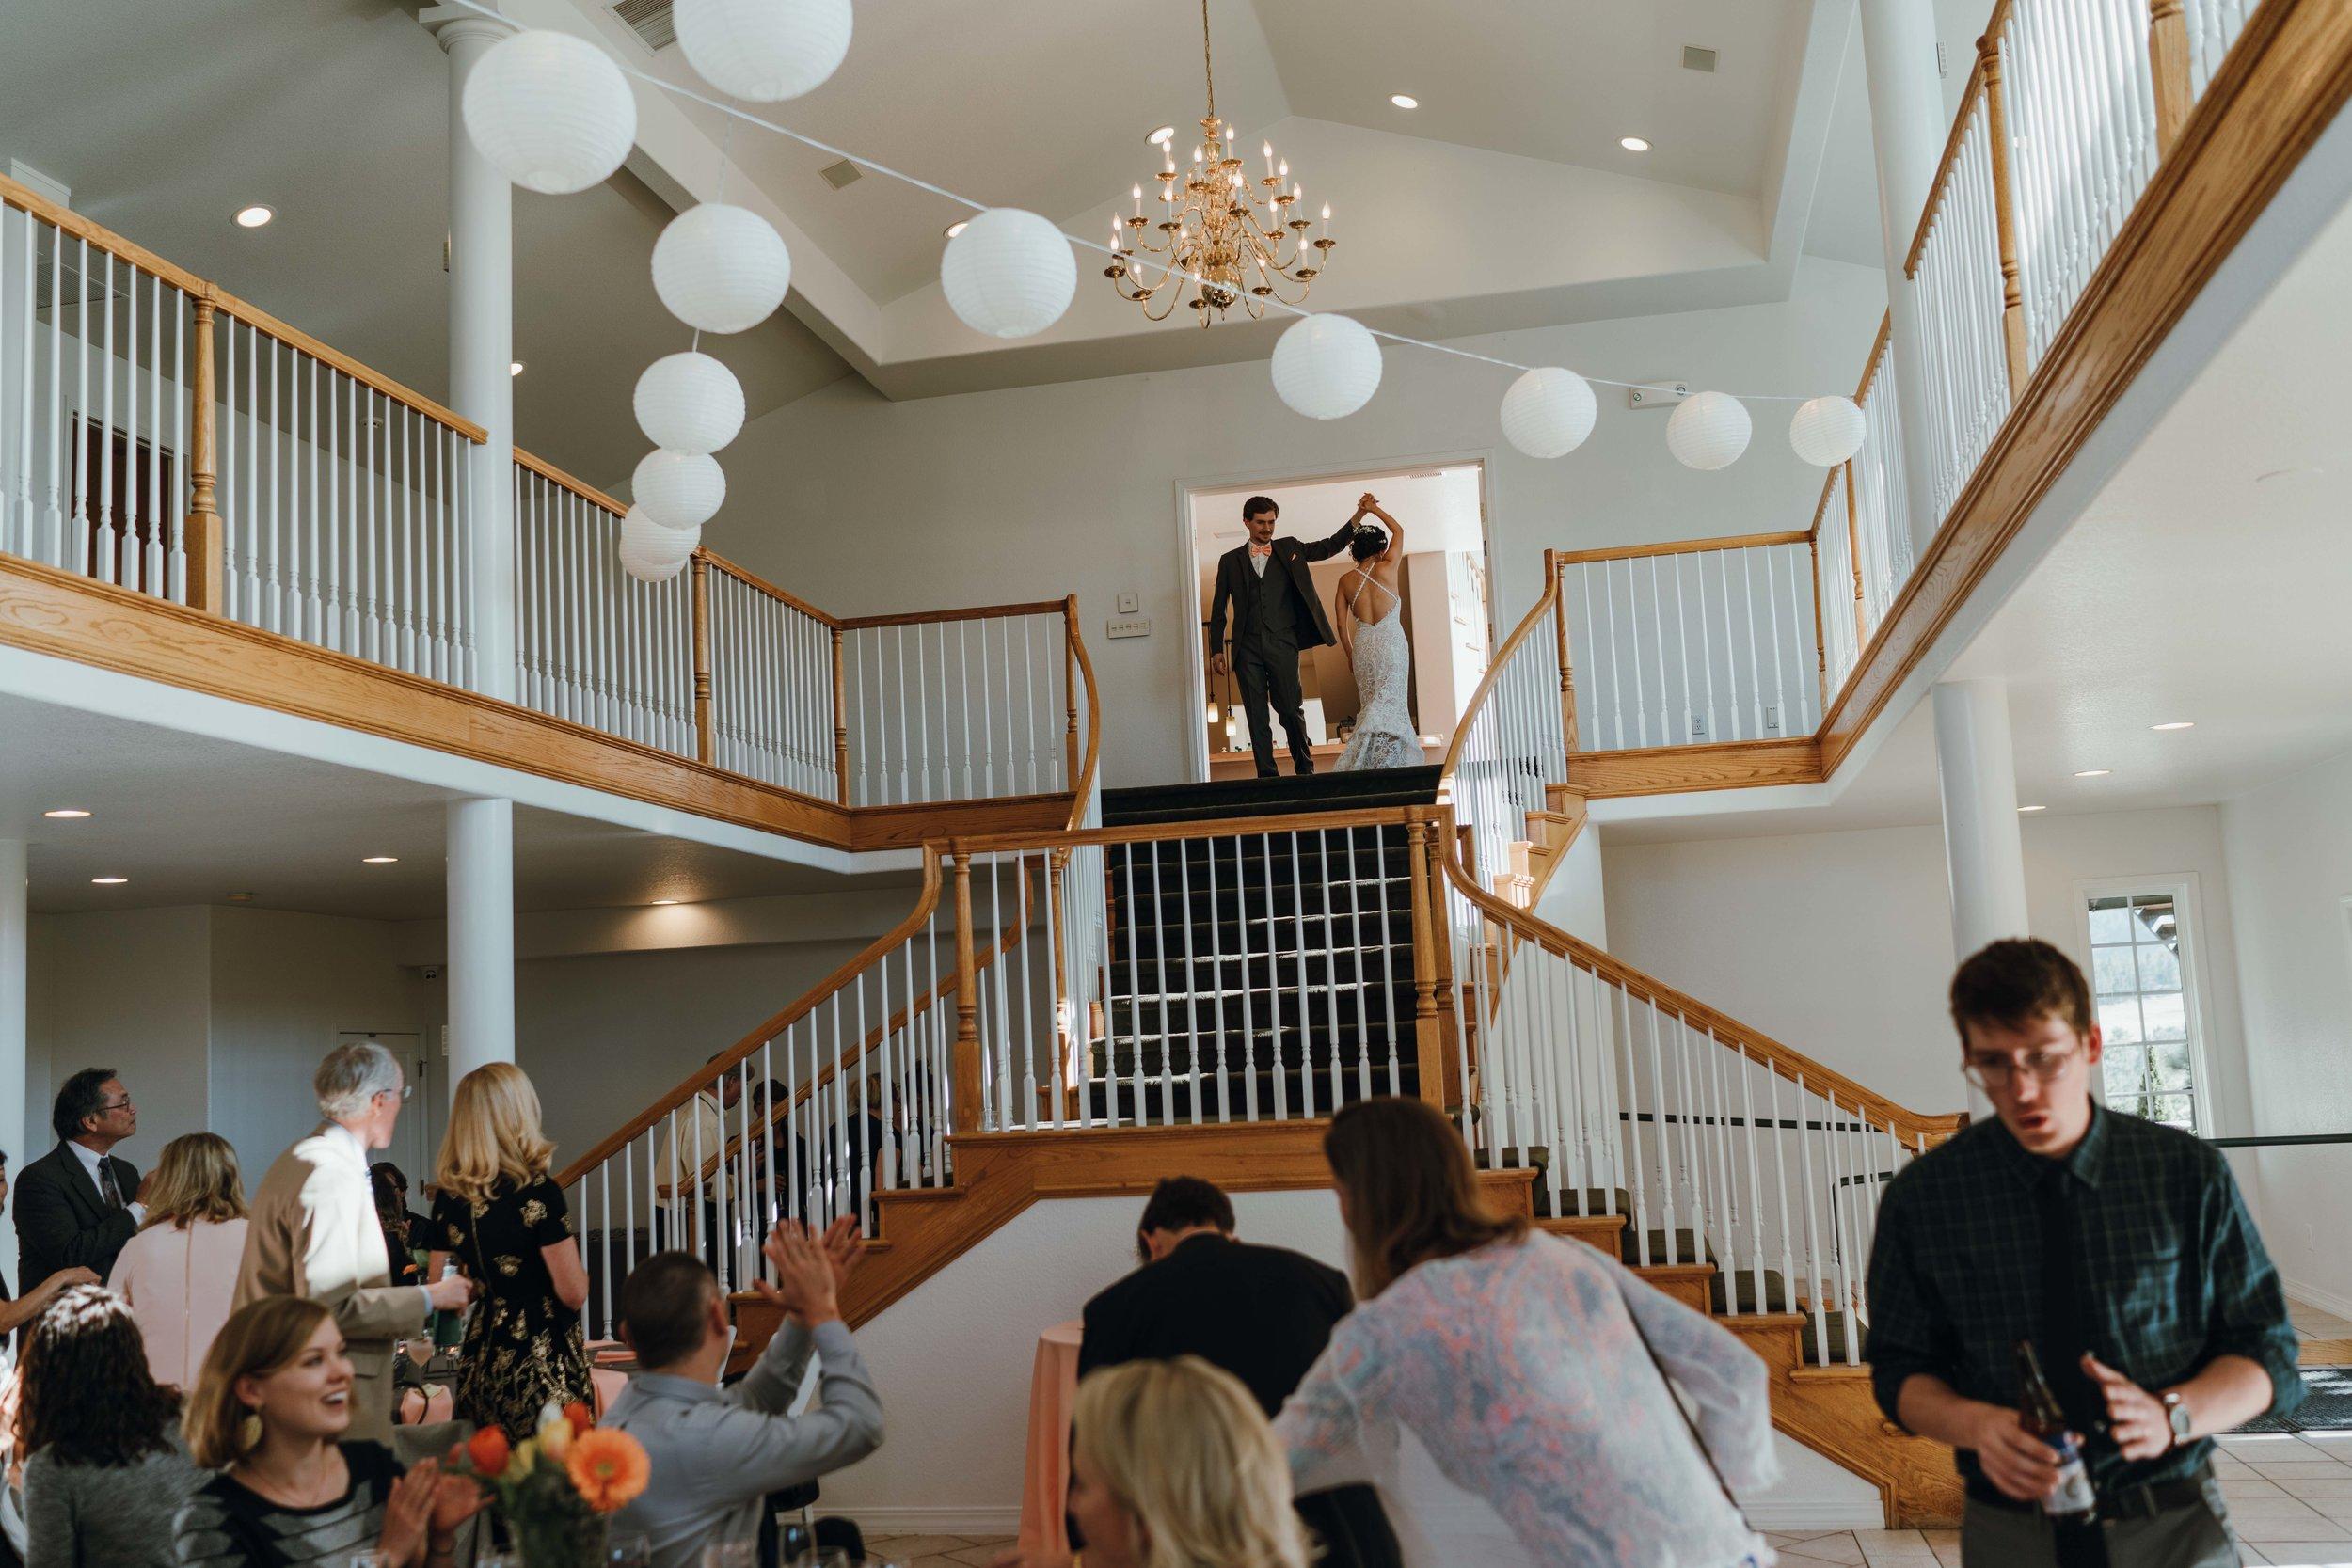 denver wedding photographer lioncrest manor in lyons ben and mali -DSC06295.jpg